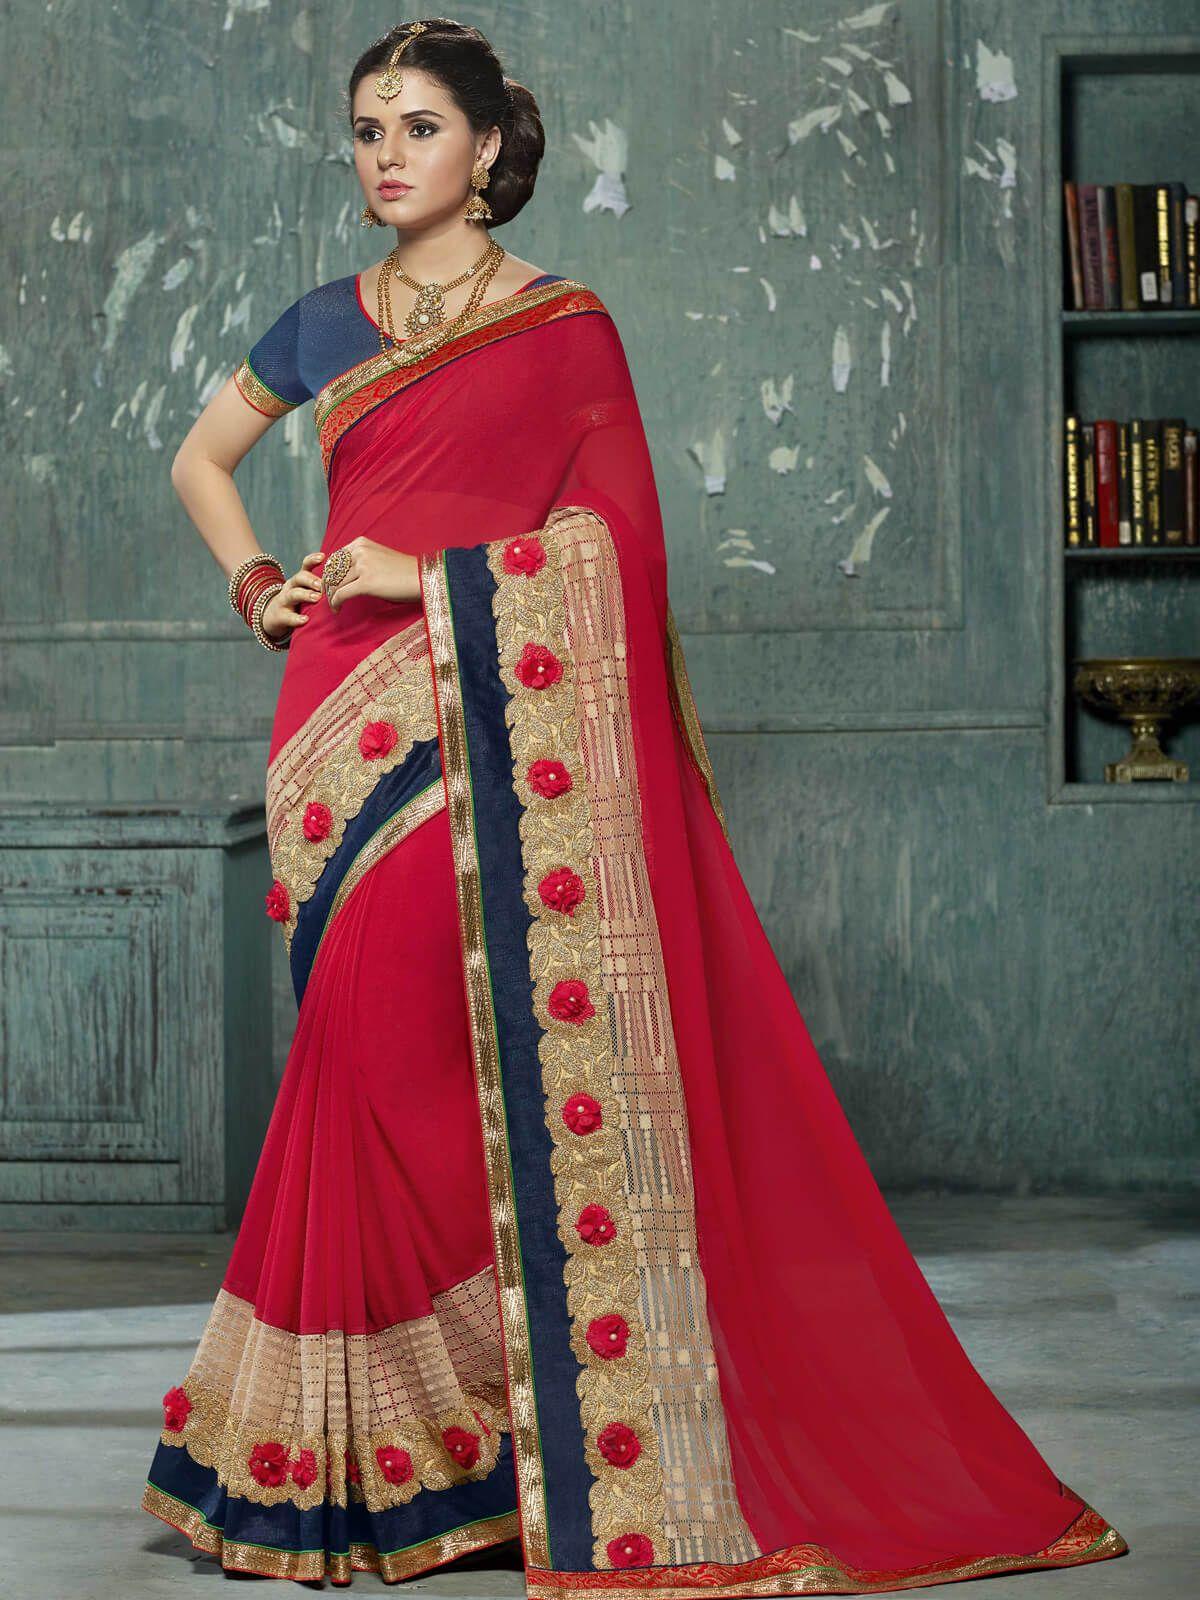 50014bf867ab74 Gracious red and blue chiffon party wear designer saree. Having fabric  chiffon, brasso,